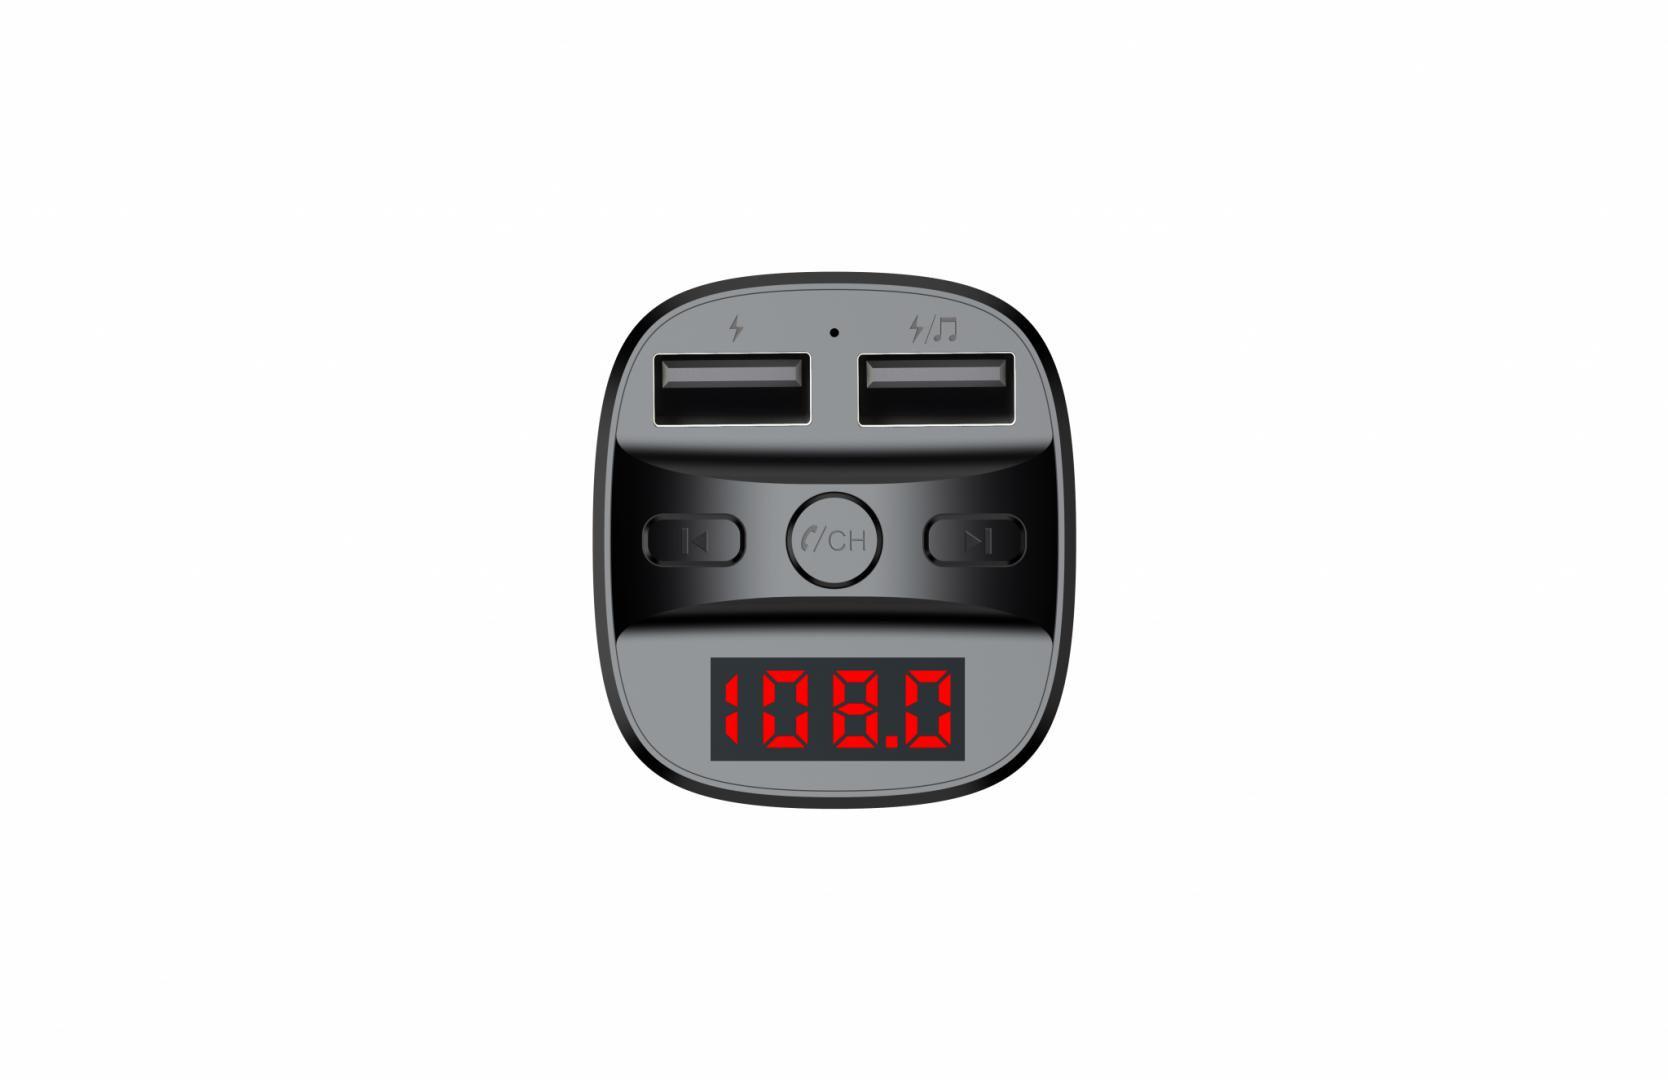 Modulator FM Serioux ABFM60, Bluetooth 5.0 , raza actiune de până la 5 m, voltaj intrare: 1x DC 12V/24V ,2 porturi USB: 1x USB DC5V 2.4A Max 1 x USB audio (pana la 32 GB), slot MicroSD (pana la 32 GB), format muzica: MP3/WMA/WAV, frecvența FM: 87.5MHz - 108.0MHZ, microfon incorporat , functii - imaginea 8